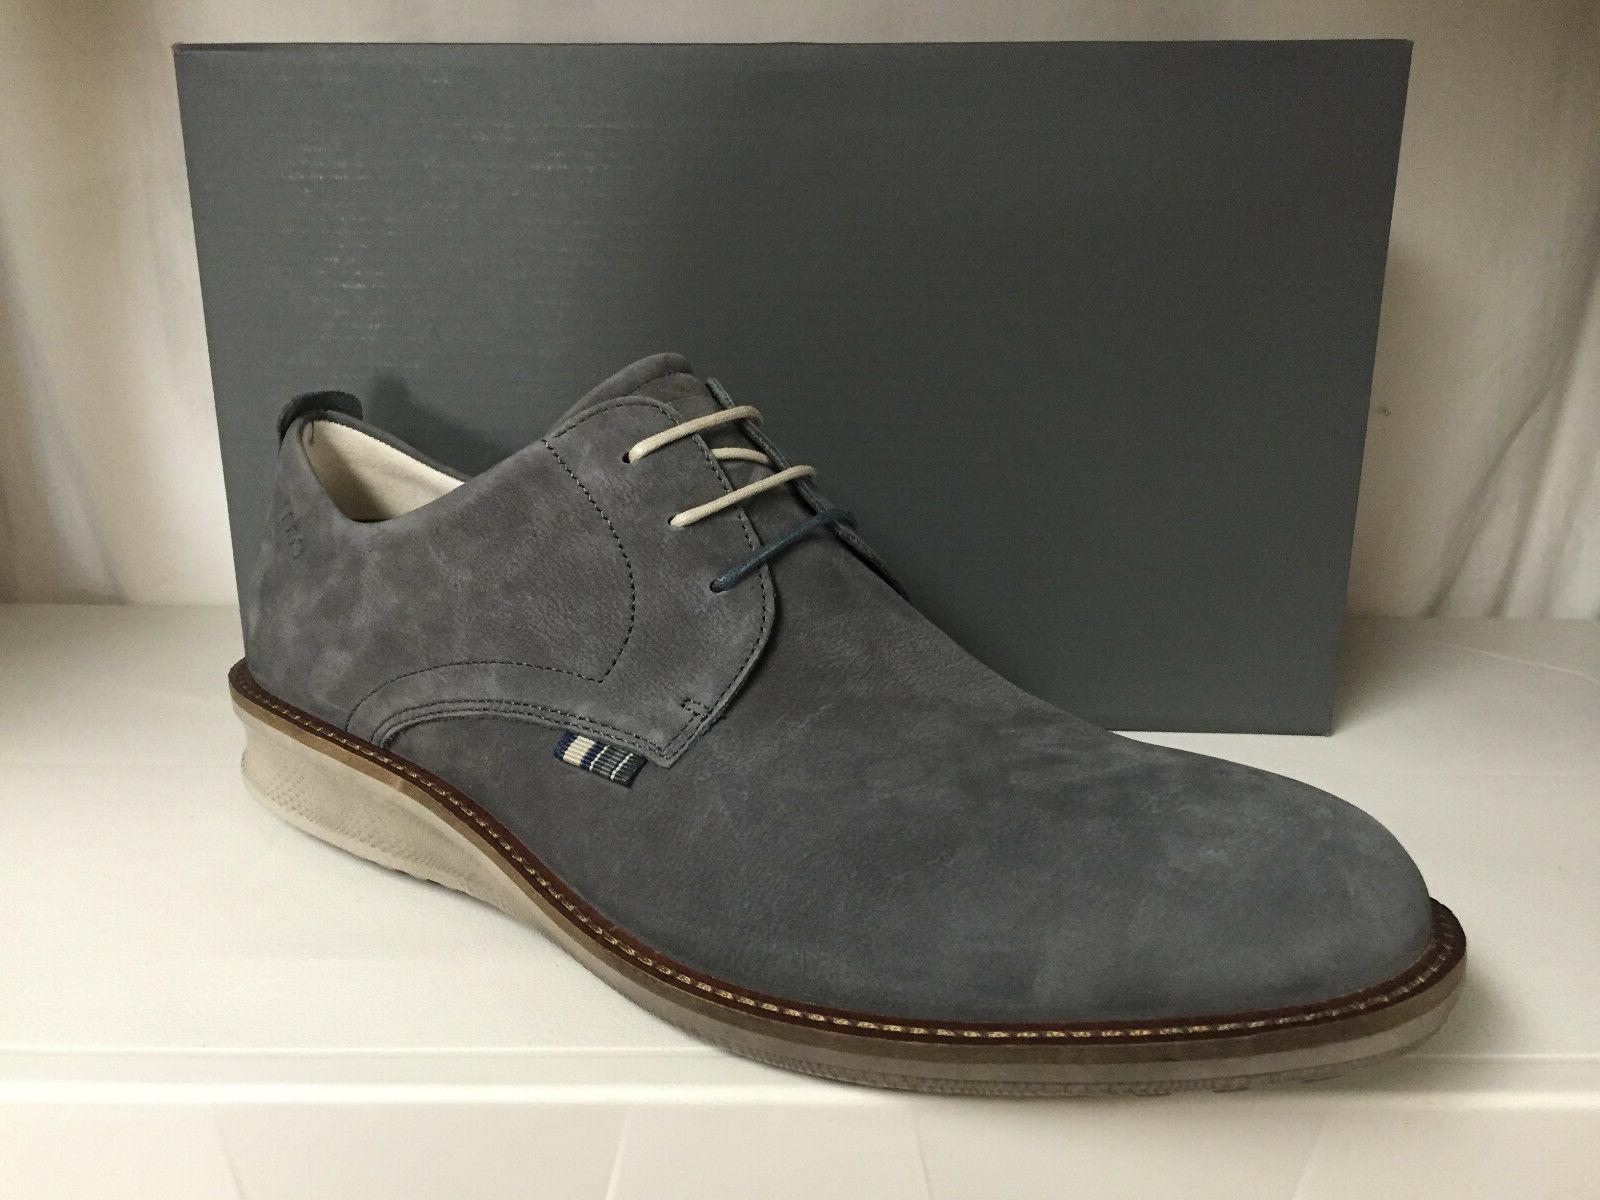 Toe Leather Dress Shoes